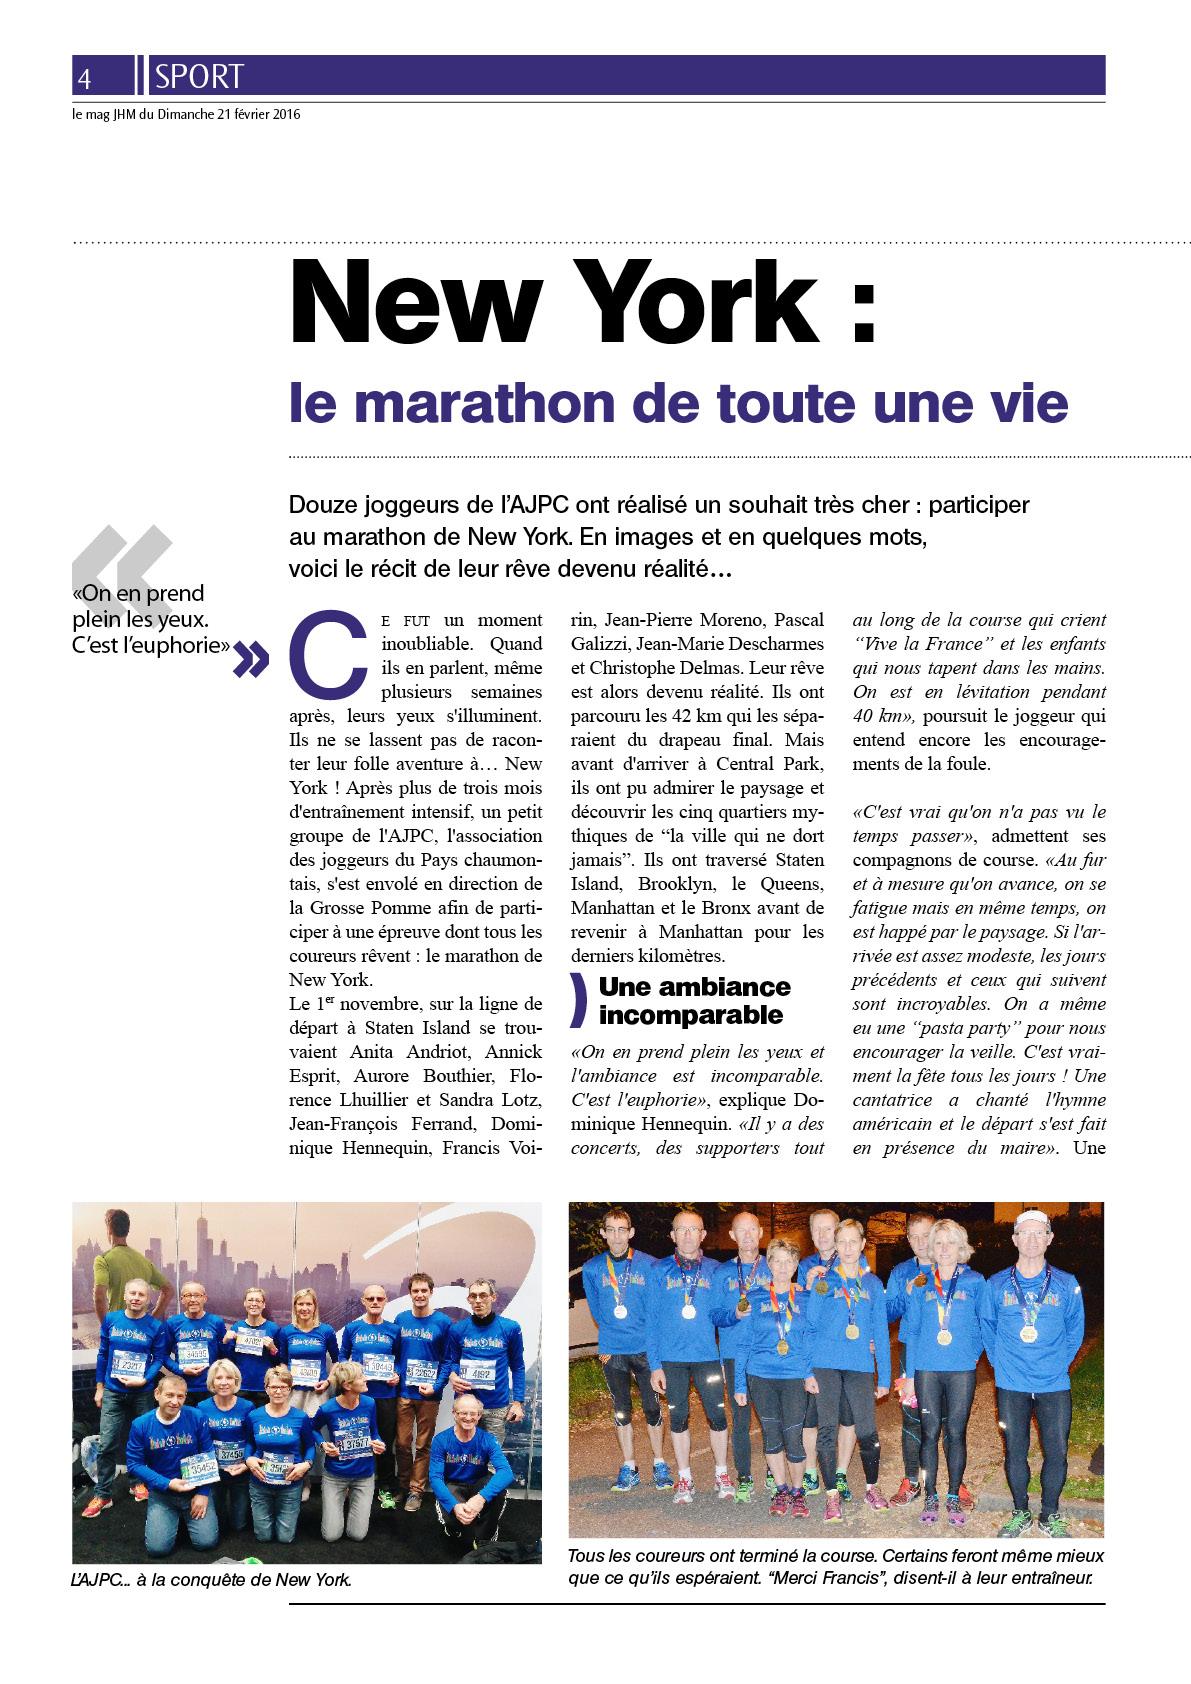 AJPC New York 1